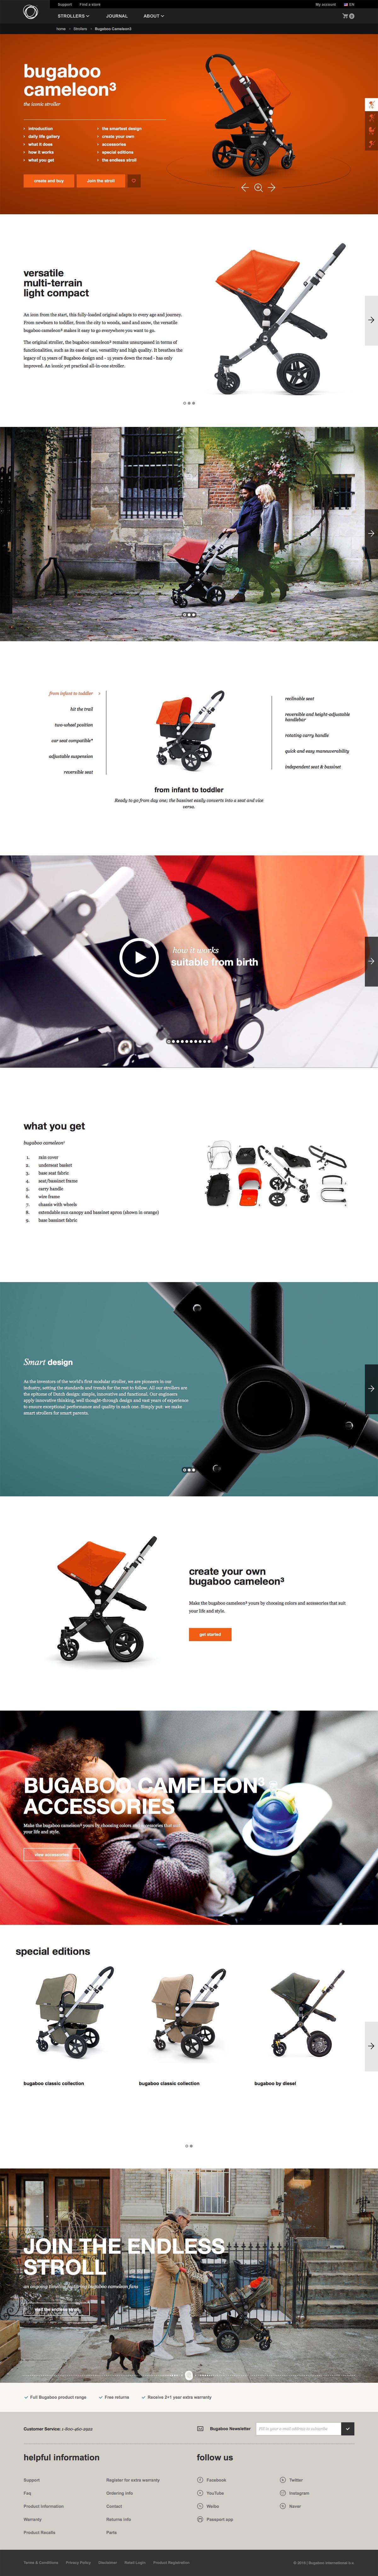 eCommerce website: Bugaboo